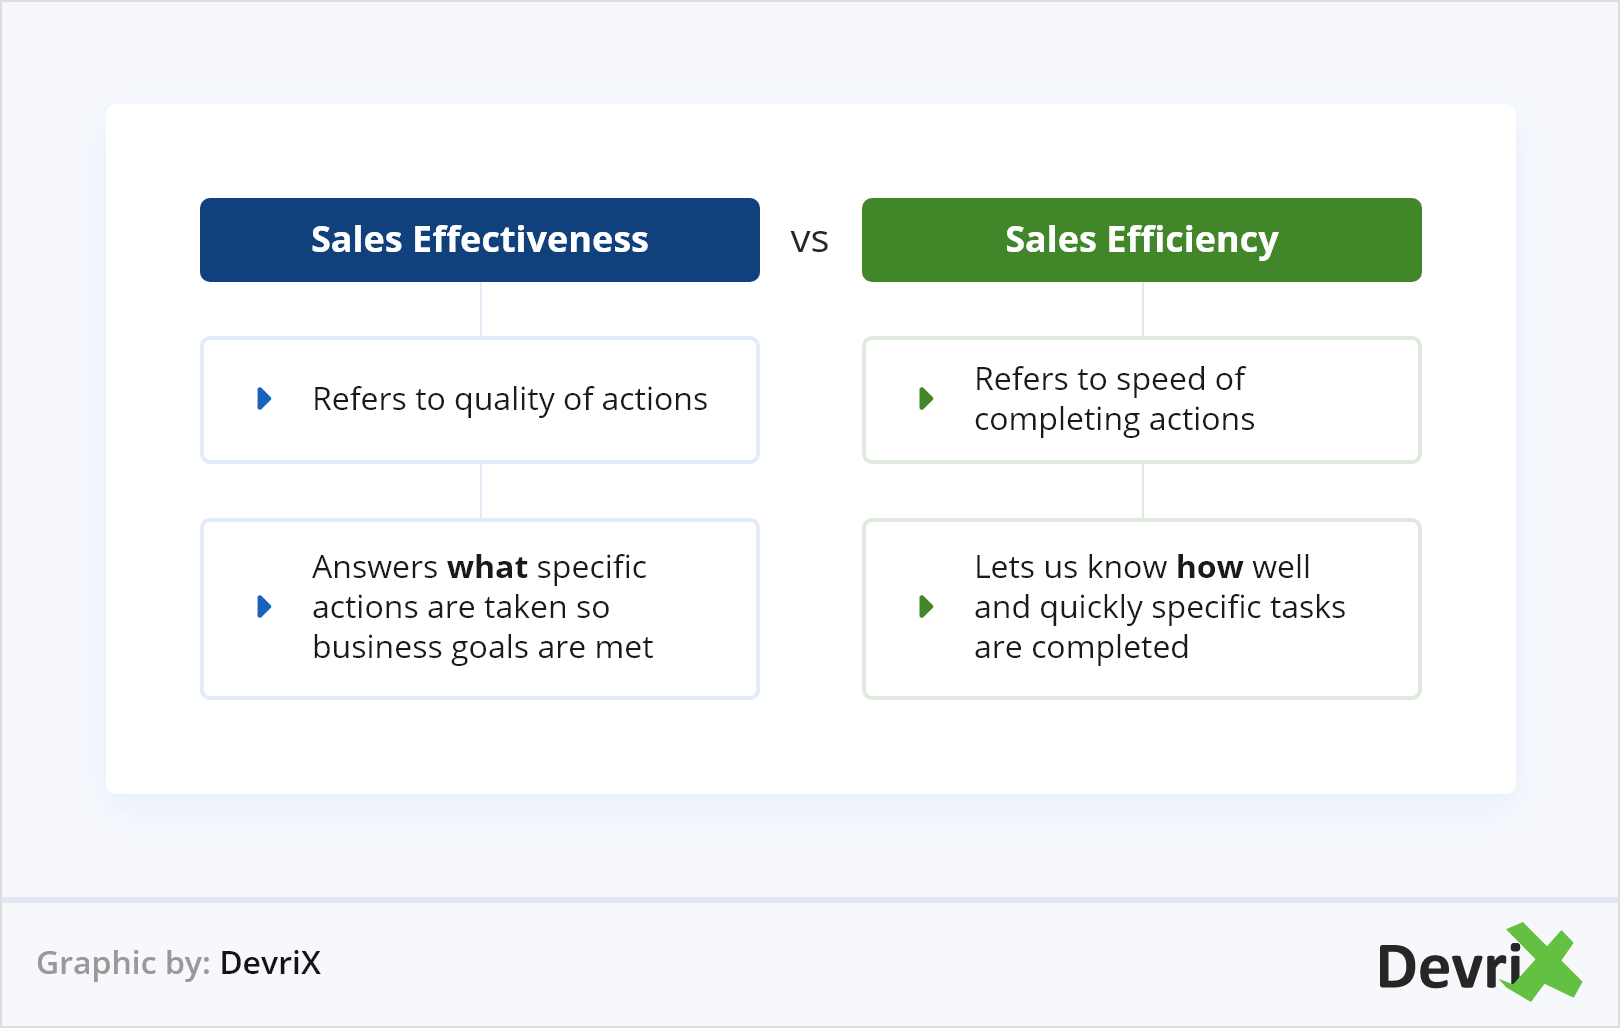 Sales Effectiveness vs Sales Efficiency